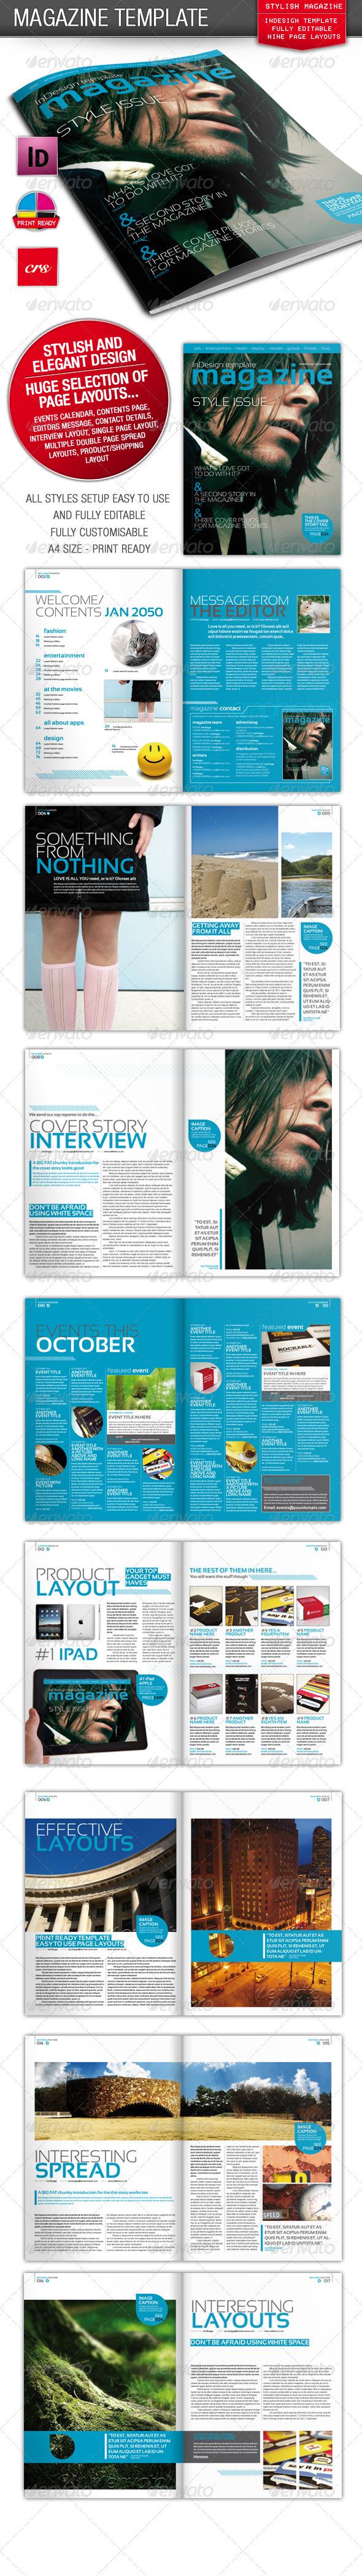 GraphicRiver Stylish InDesign Magazine Template 264182